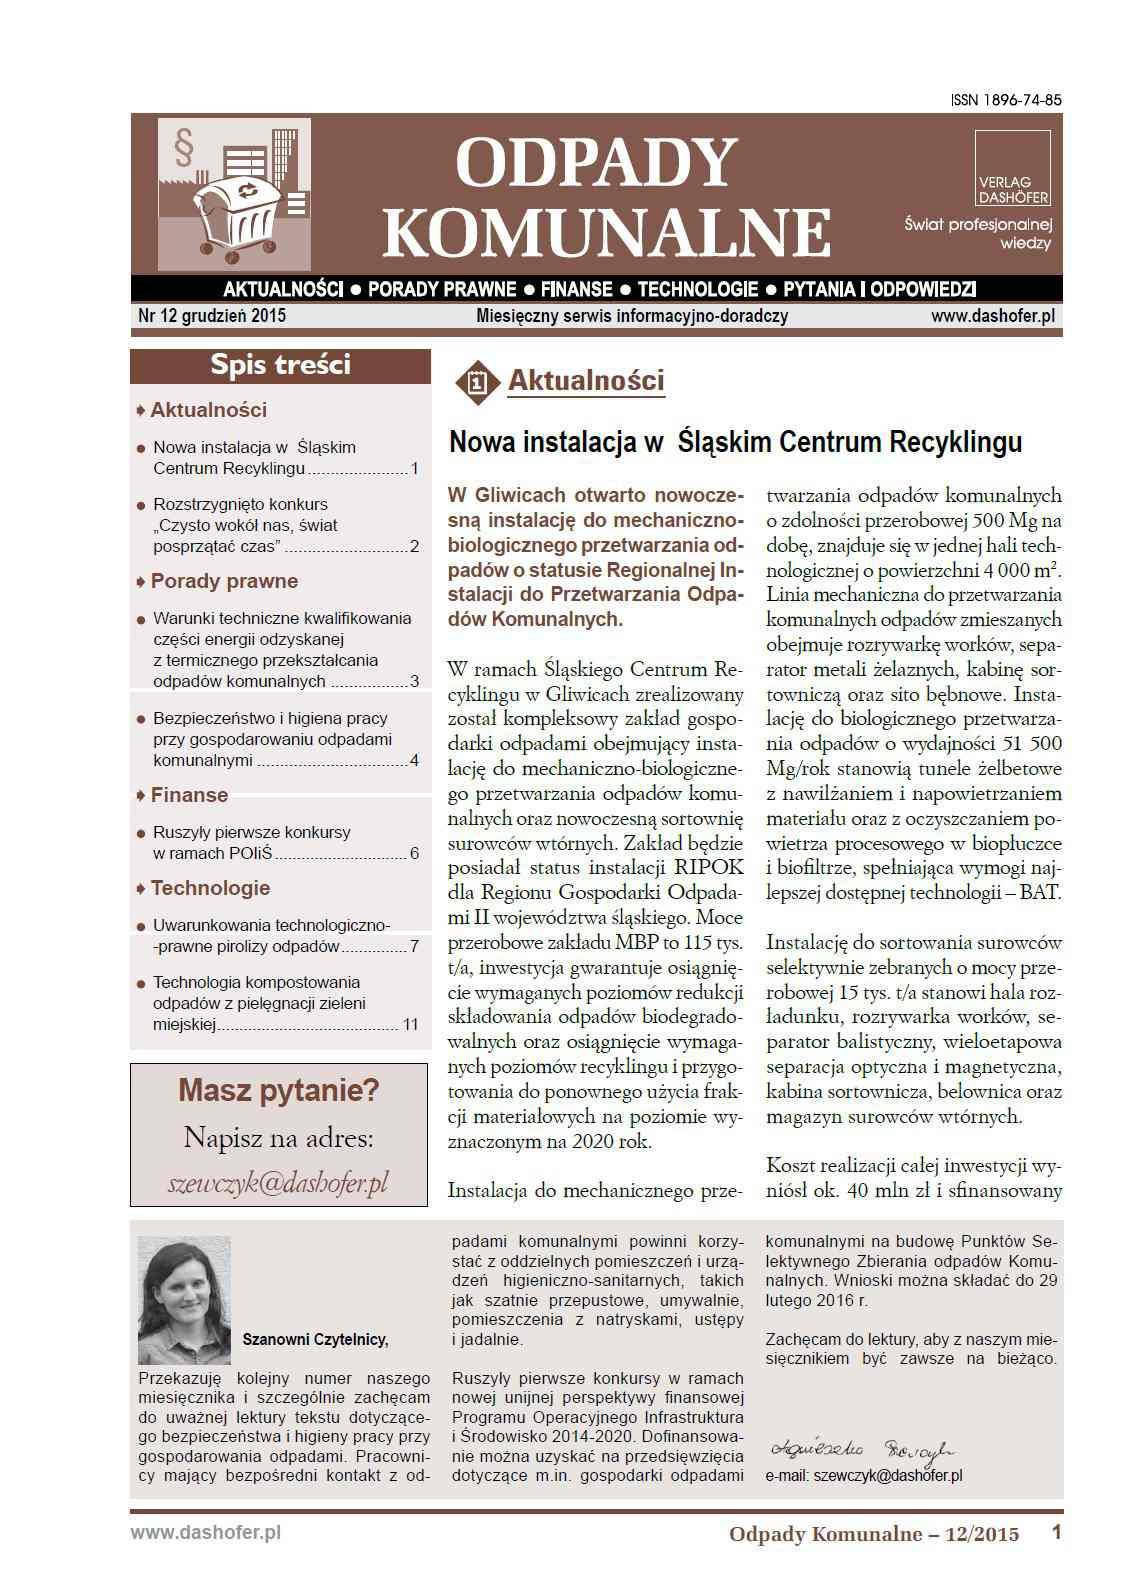 Odpady komunalne. Nr 12/2015 - Ebook (Książka PDF) do pobrania w formacie PDF